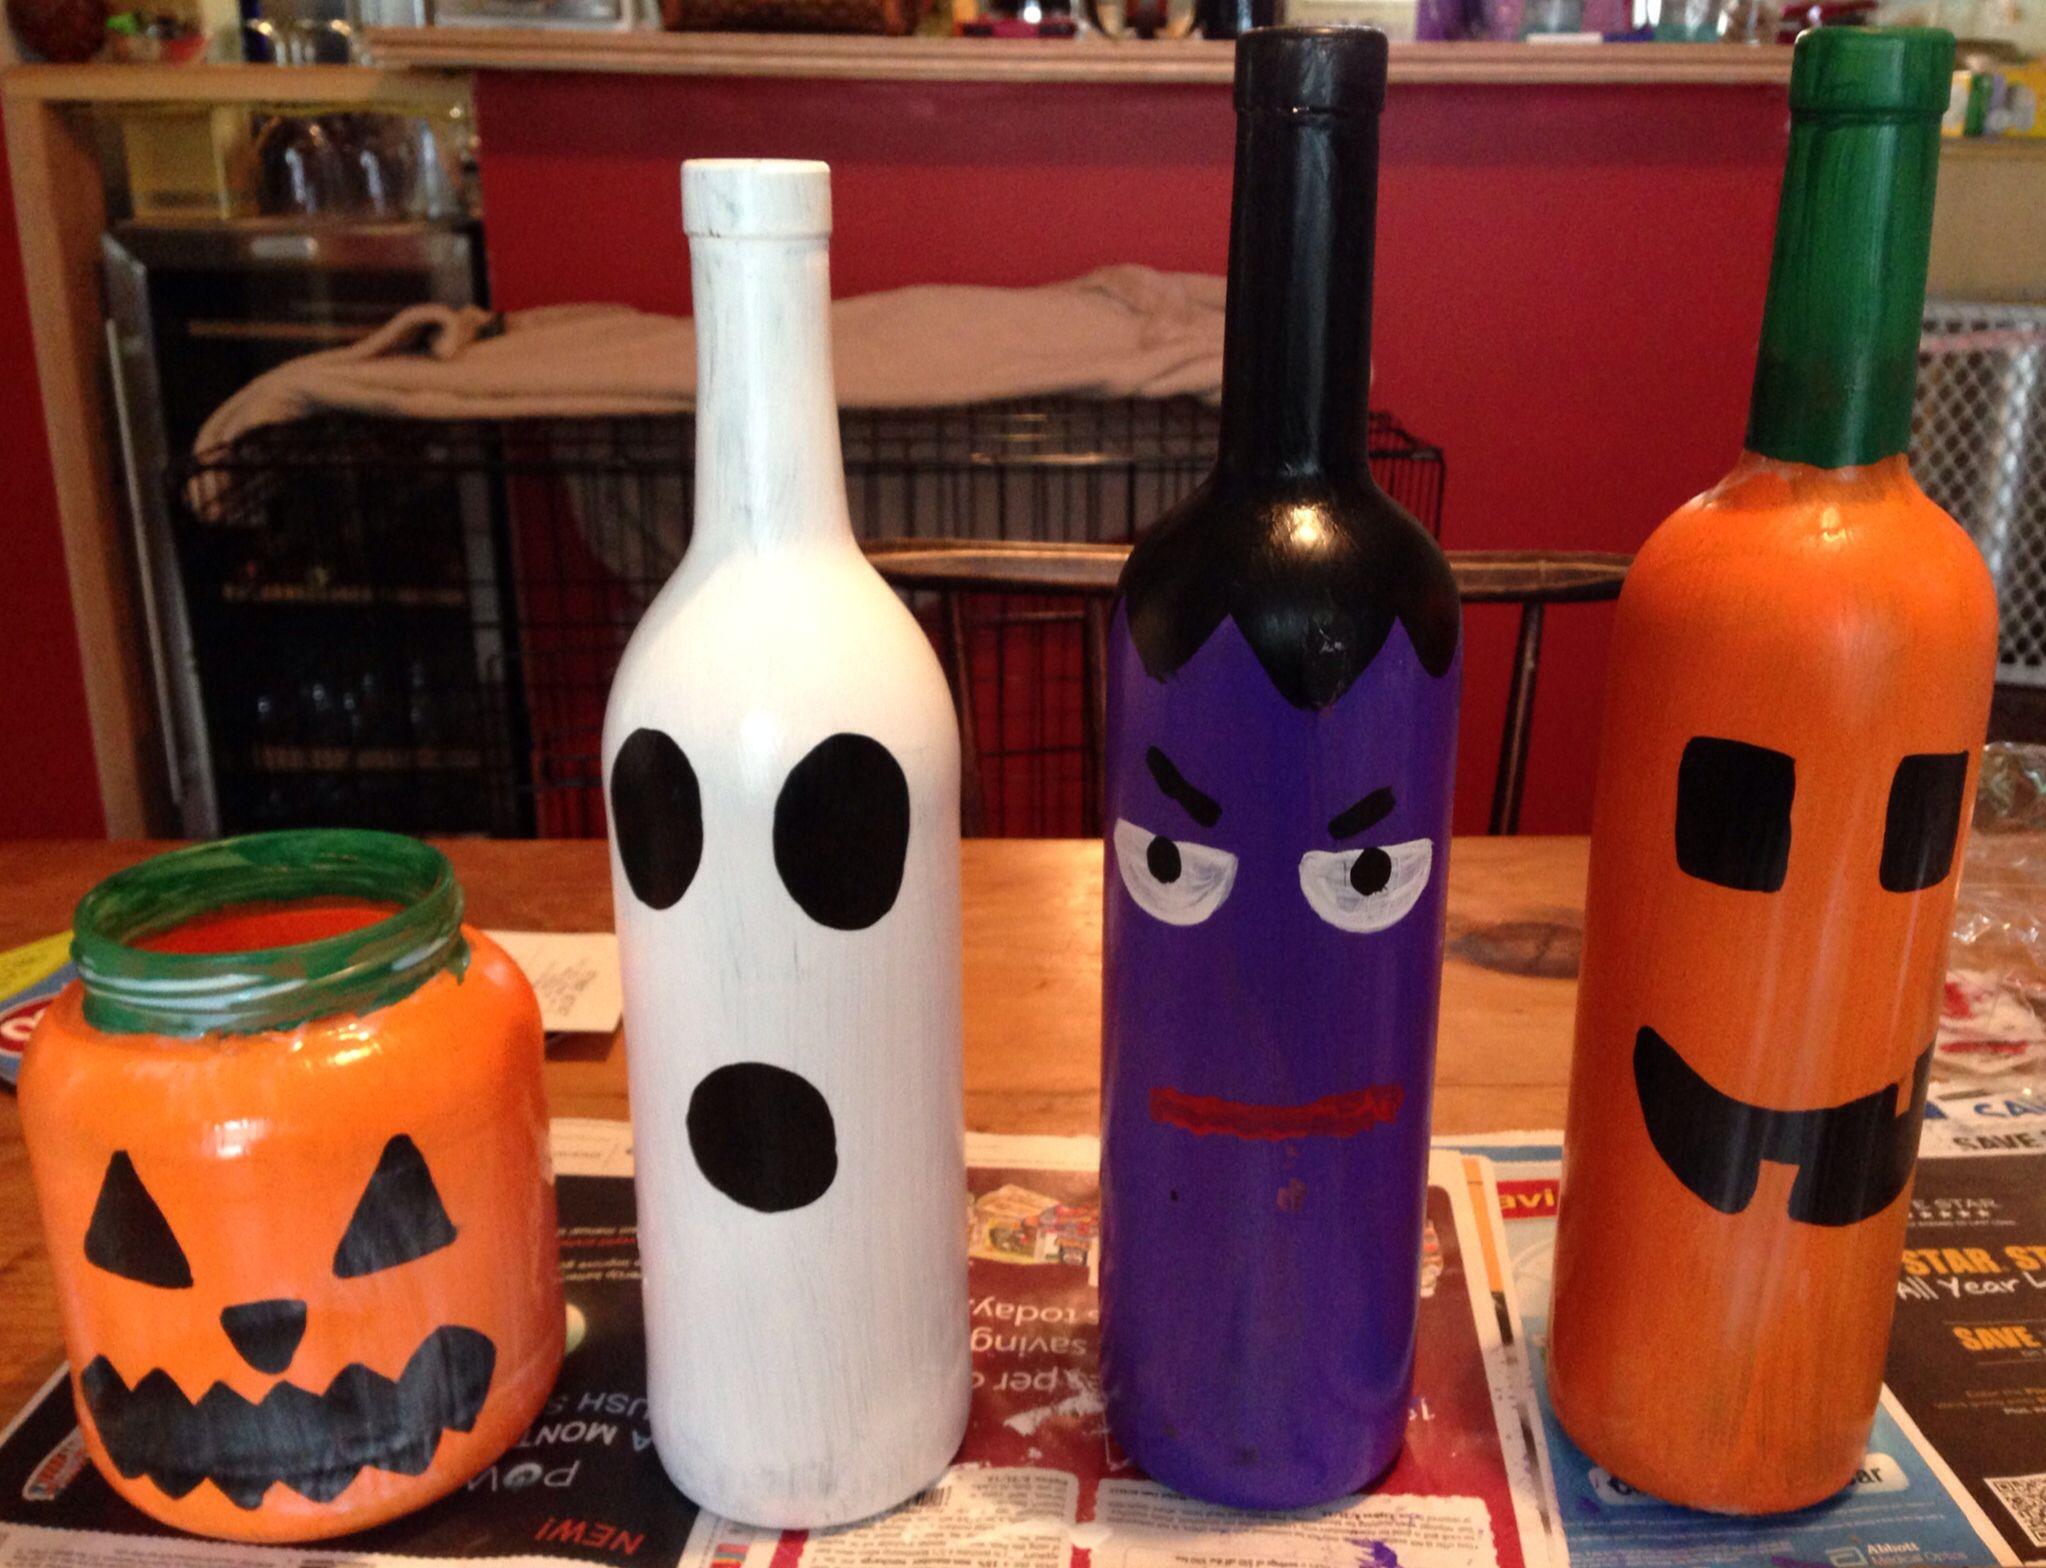 Halloween Wine Bottles Halloween Wine Bottles Halloween Wine Bottles Decoration